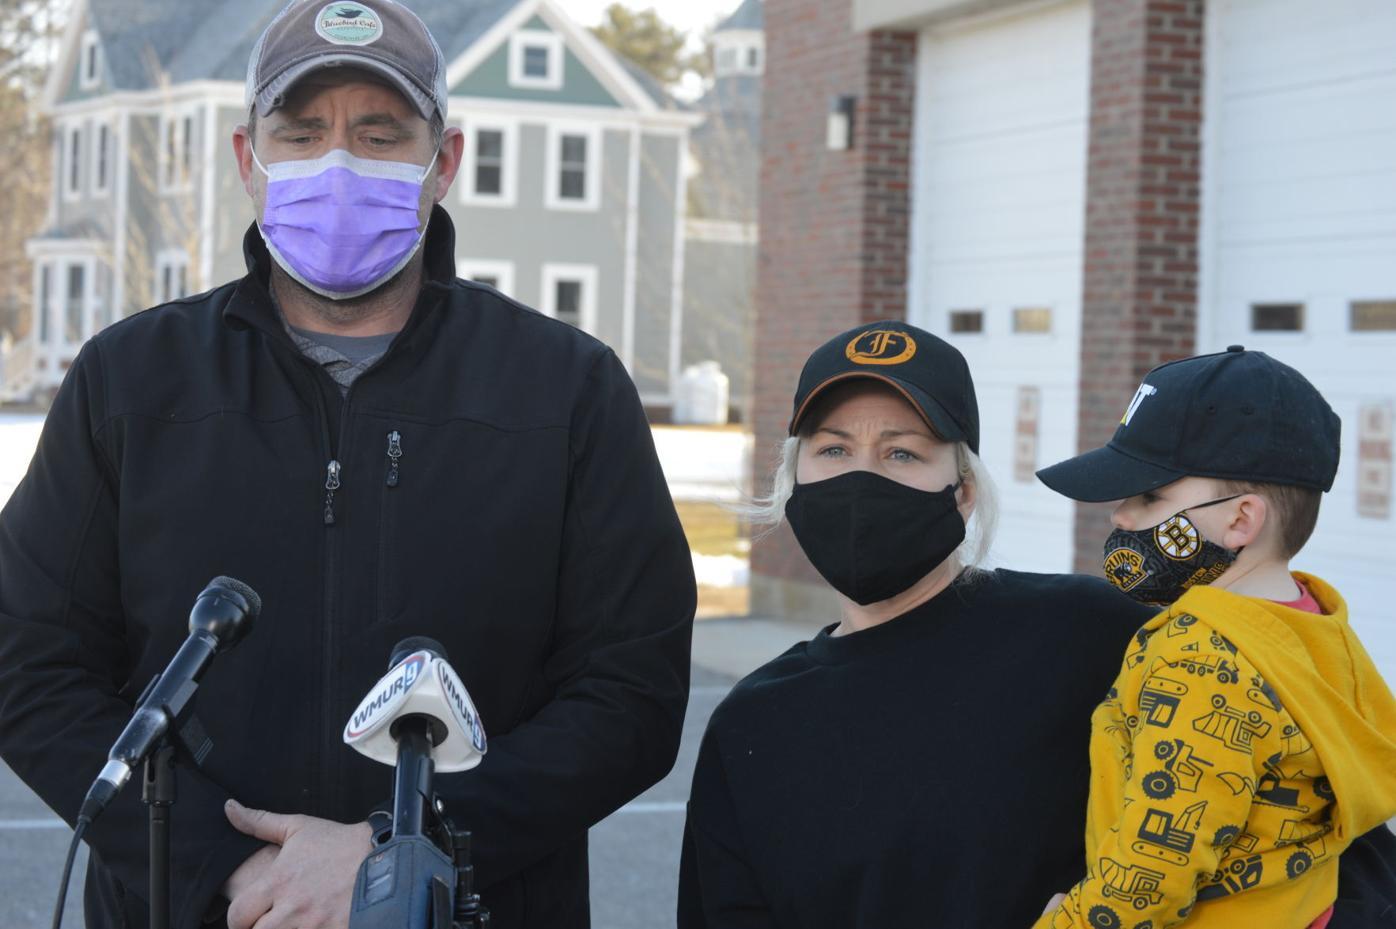 Kingston Fire Chief Graham Pellerin, his wife, Samantha, and their son, Gunner